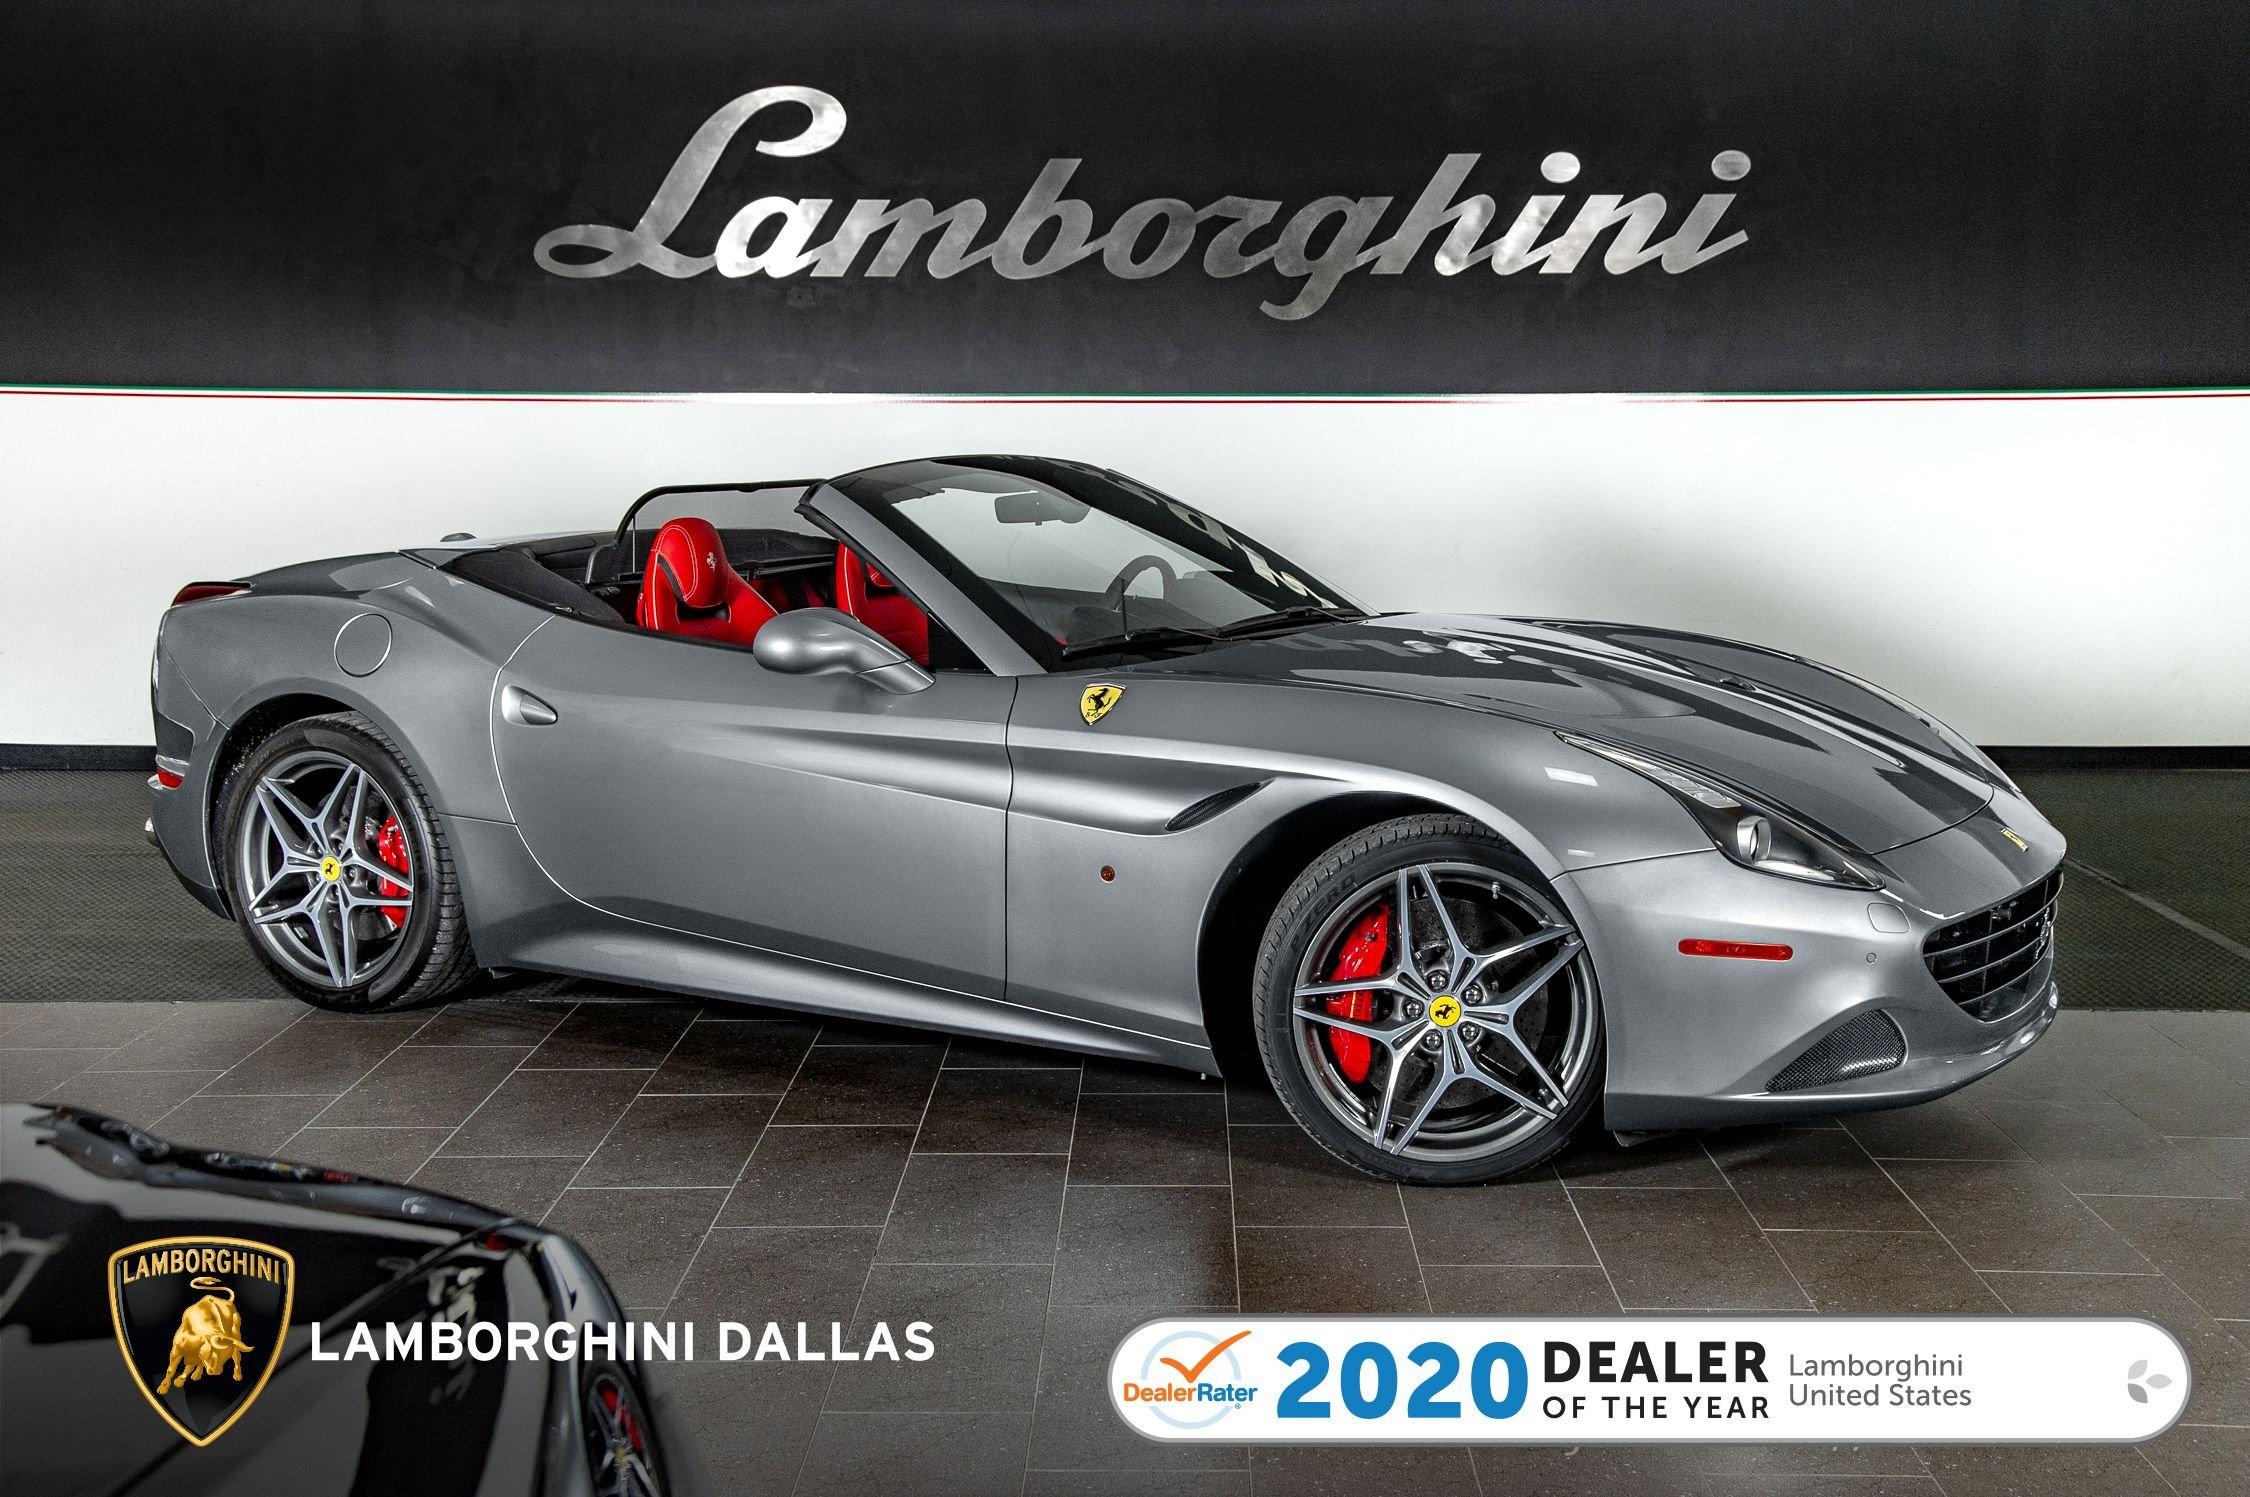 Used 2017 Ferrari California T For Sale Richardson Tx Stock 20l0252a Vin Zff77xja1h0223400